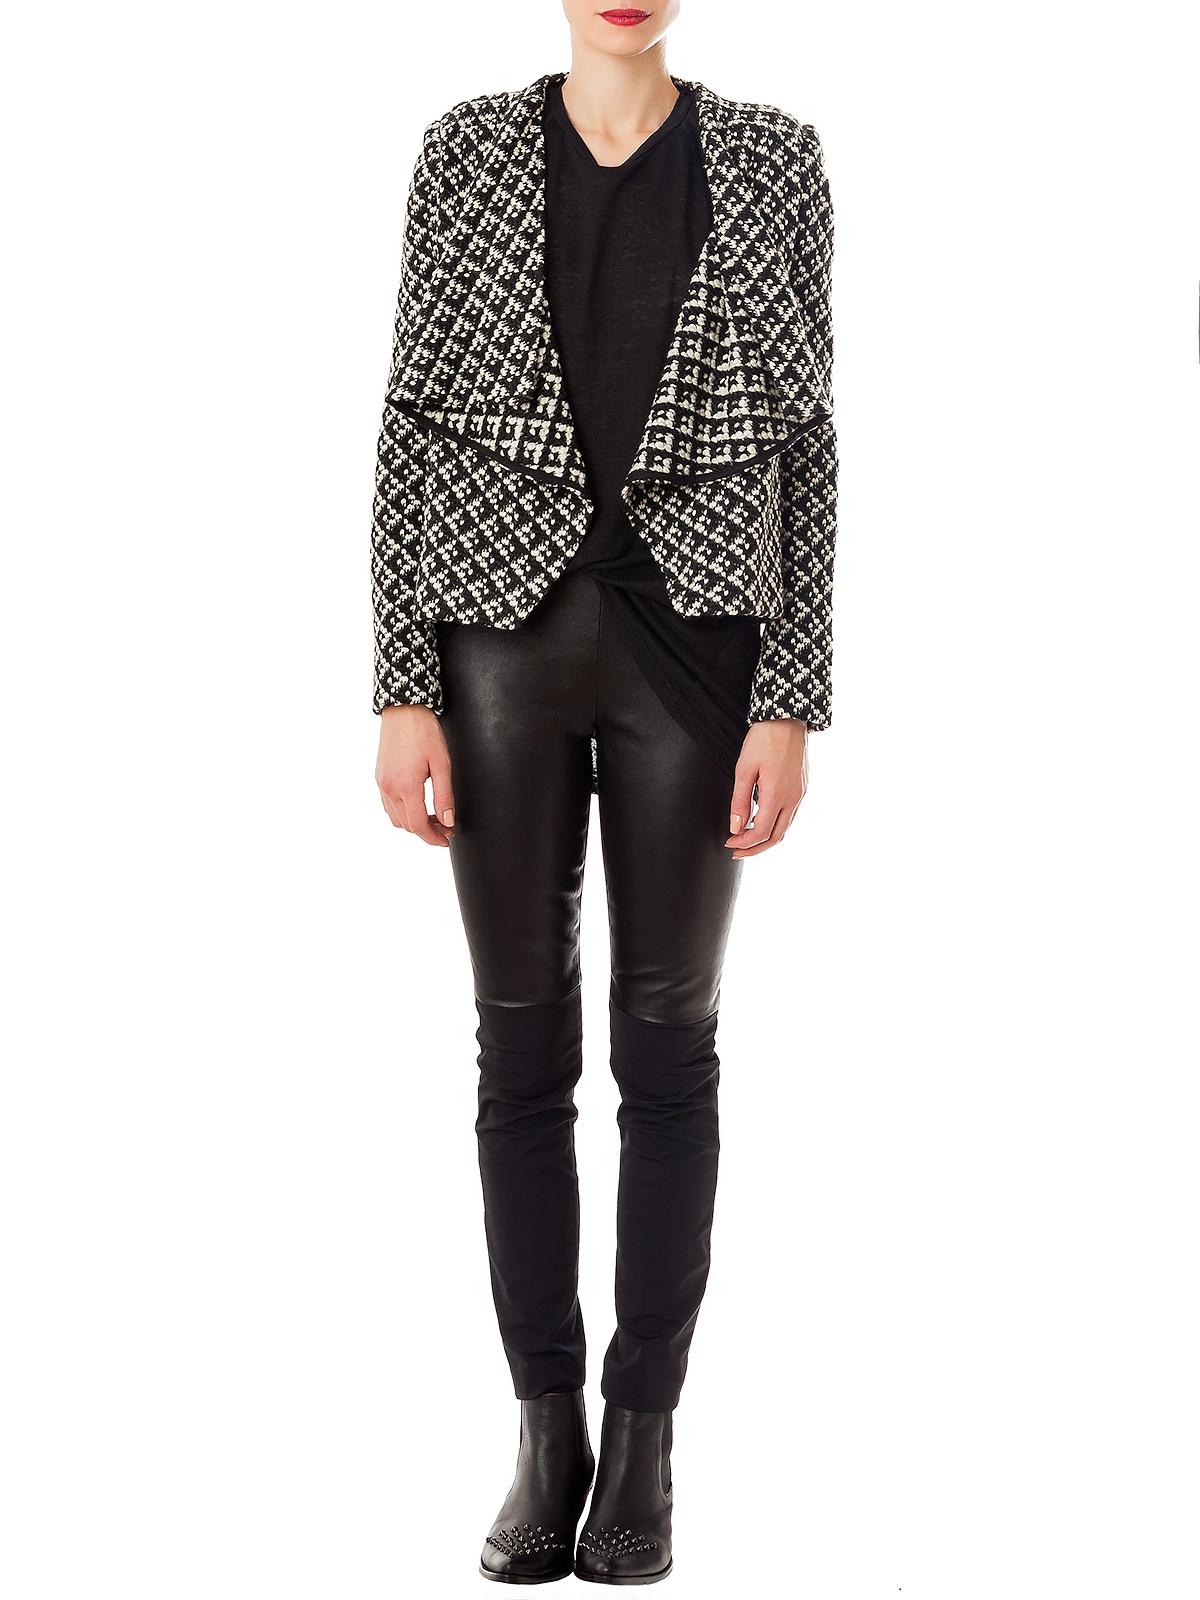 ILARIO TWEED JACKET   GIRISSIMA.COM - Collectible fashion to love and to last